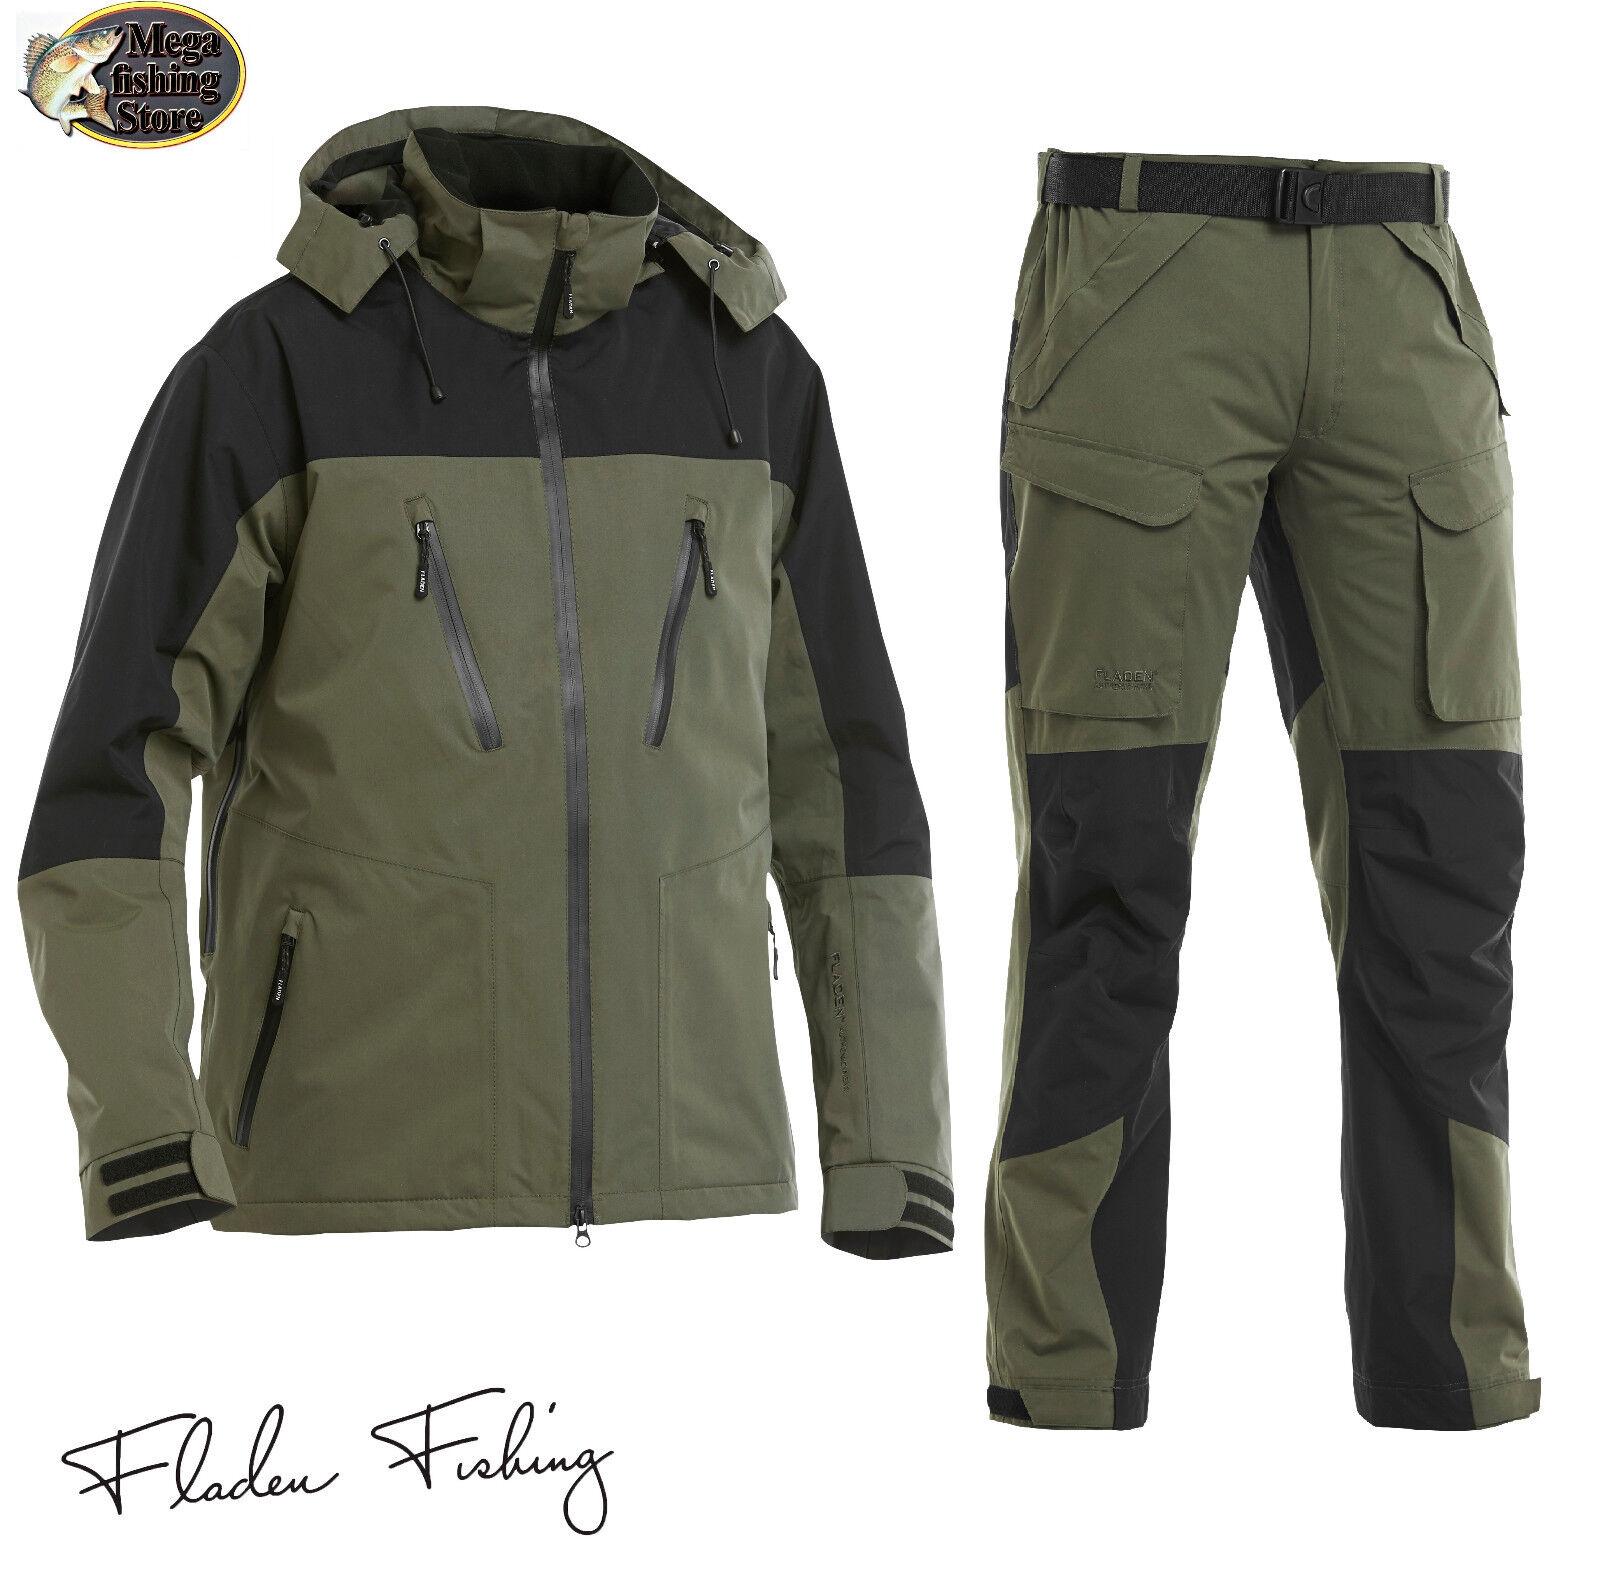 M Thermal Suits Angel Anzug Angler Anzug Kva Quantum Qualitäts Thermo Anzug Gr Angelsport Anzüge